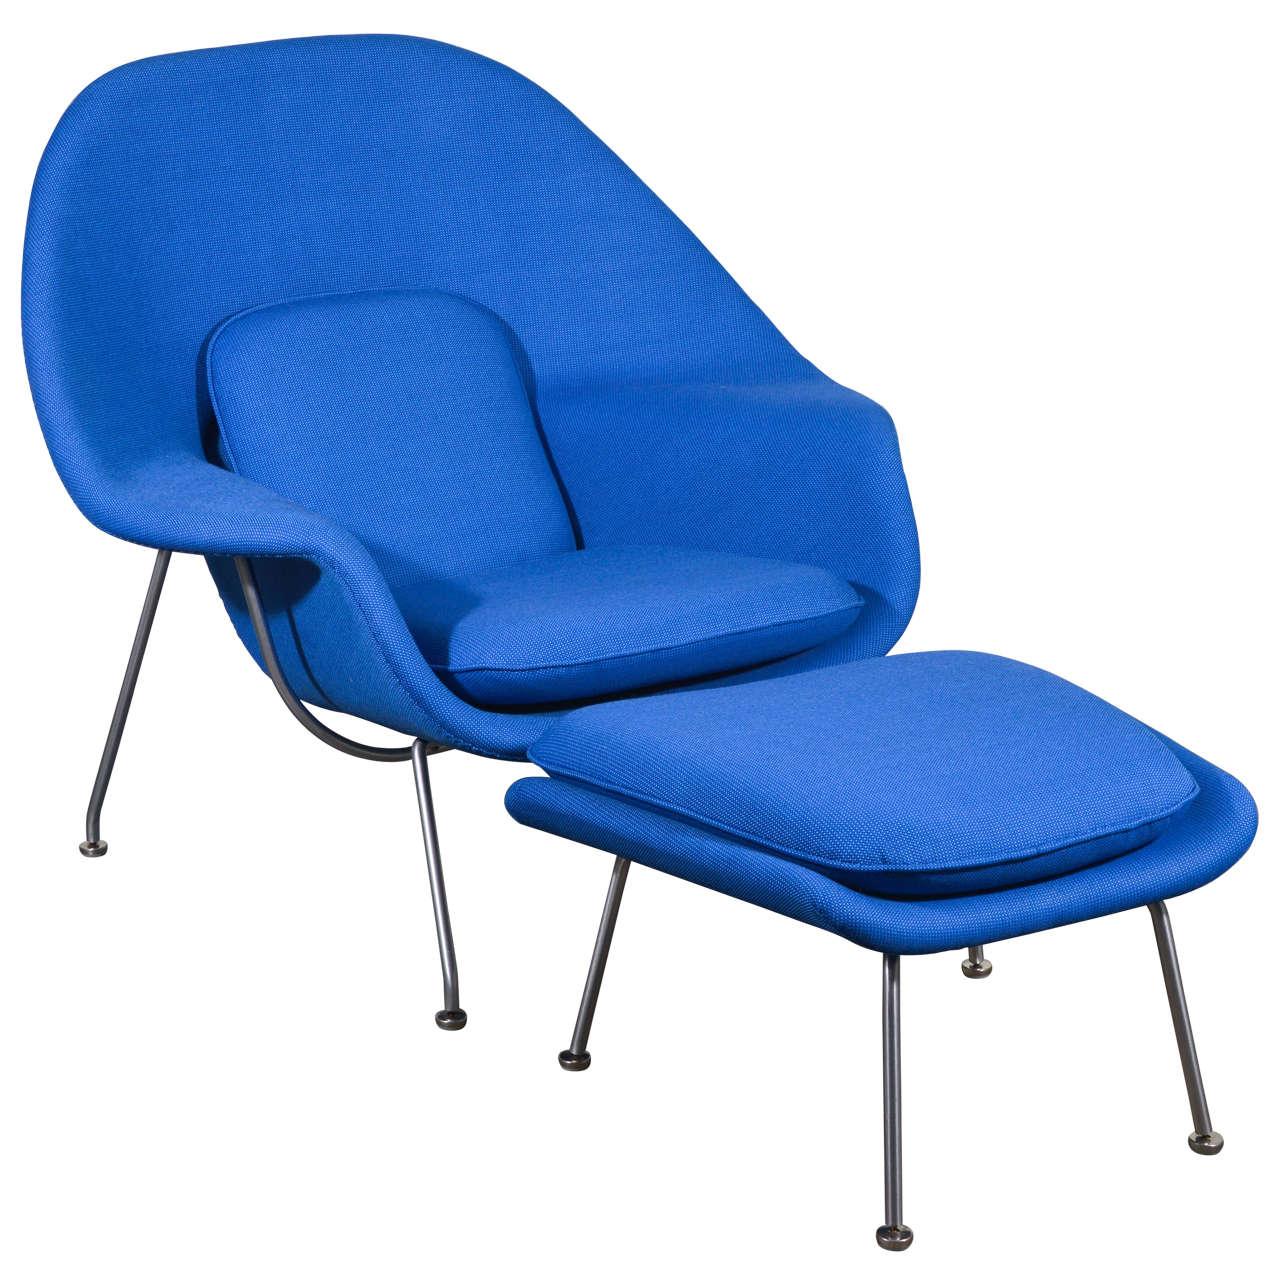 eero saarinen womb chair and ottoman in vintage girard fabric at 1stdibs. Black Bedroom Furniture Sets. Home Design Ideas